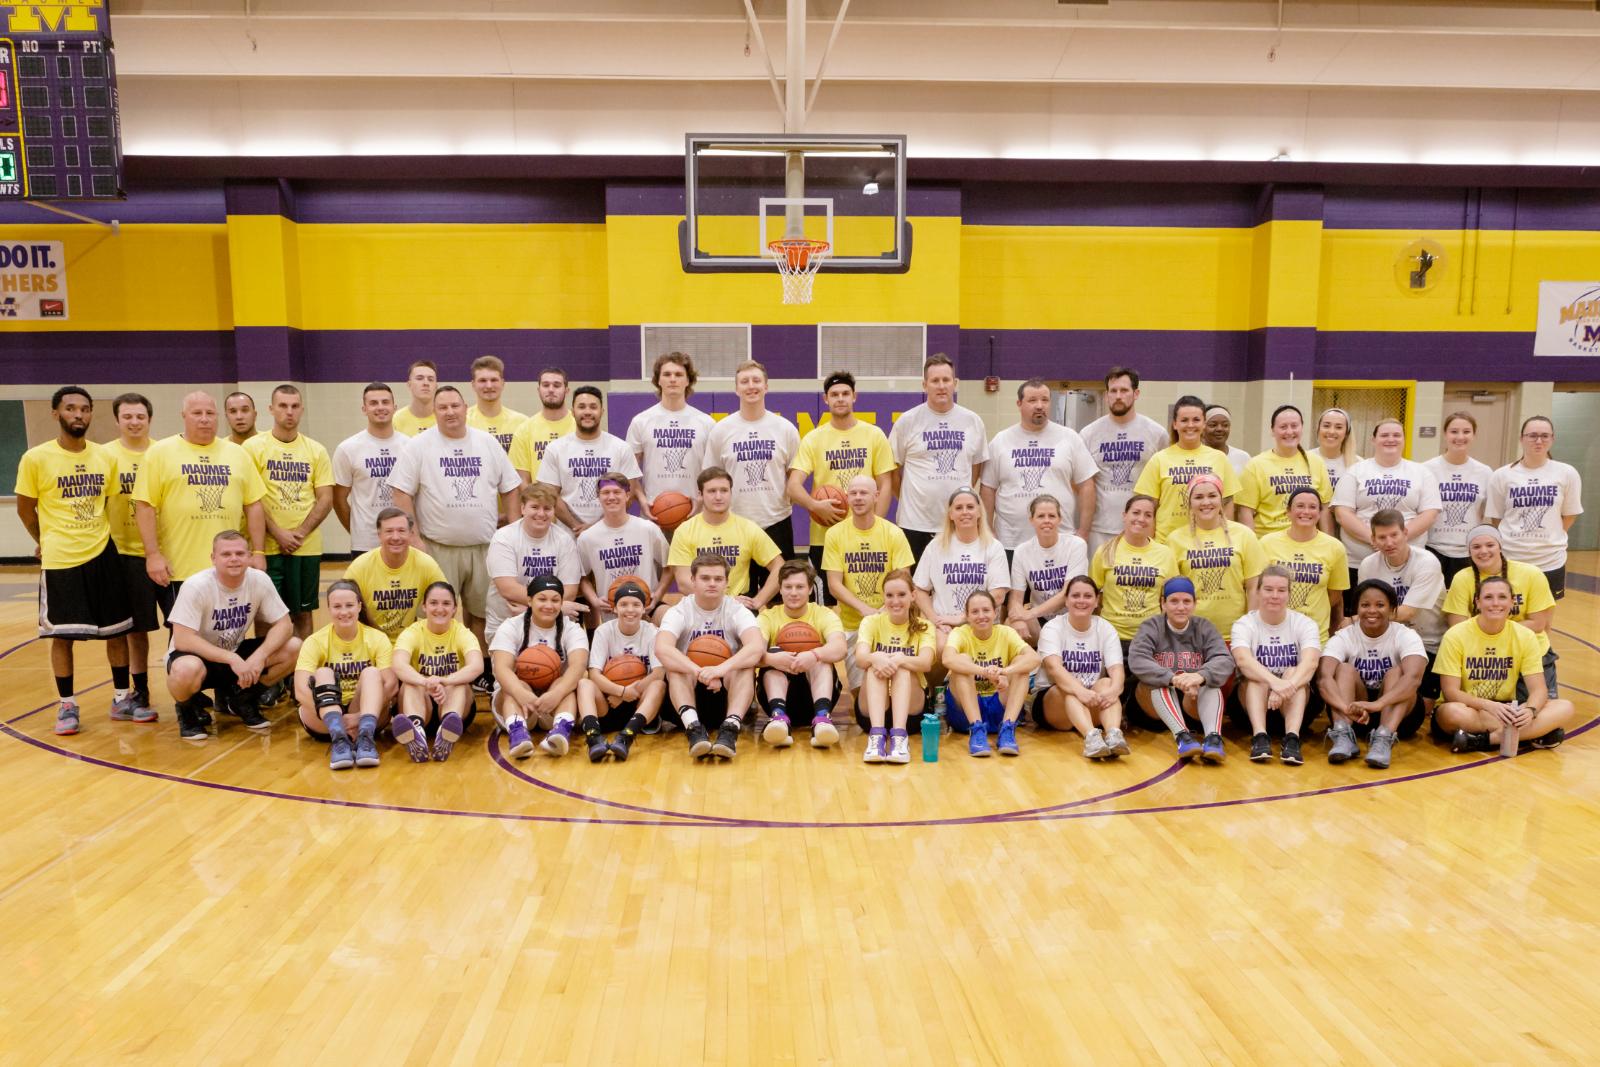 Alumni Basketball Game Opens Winter Season